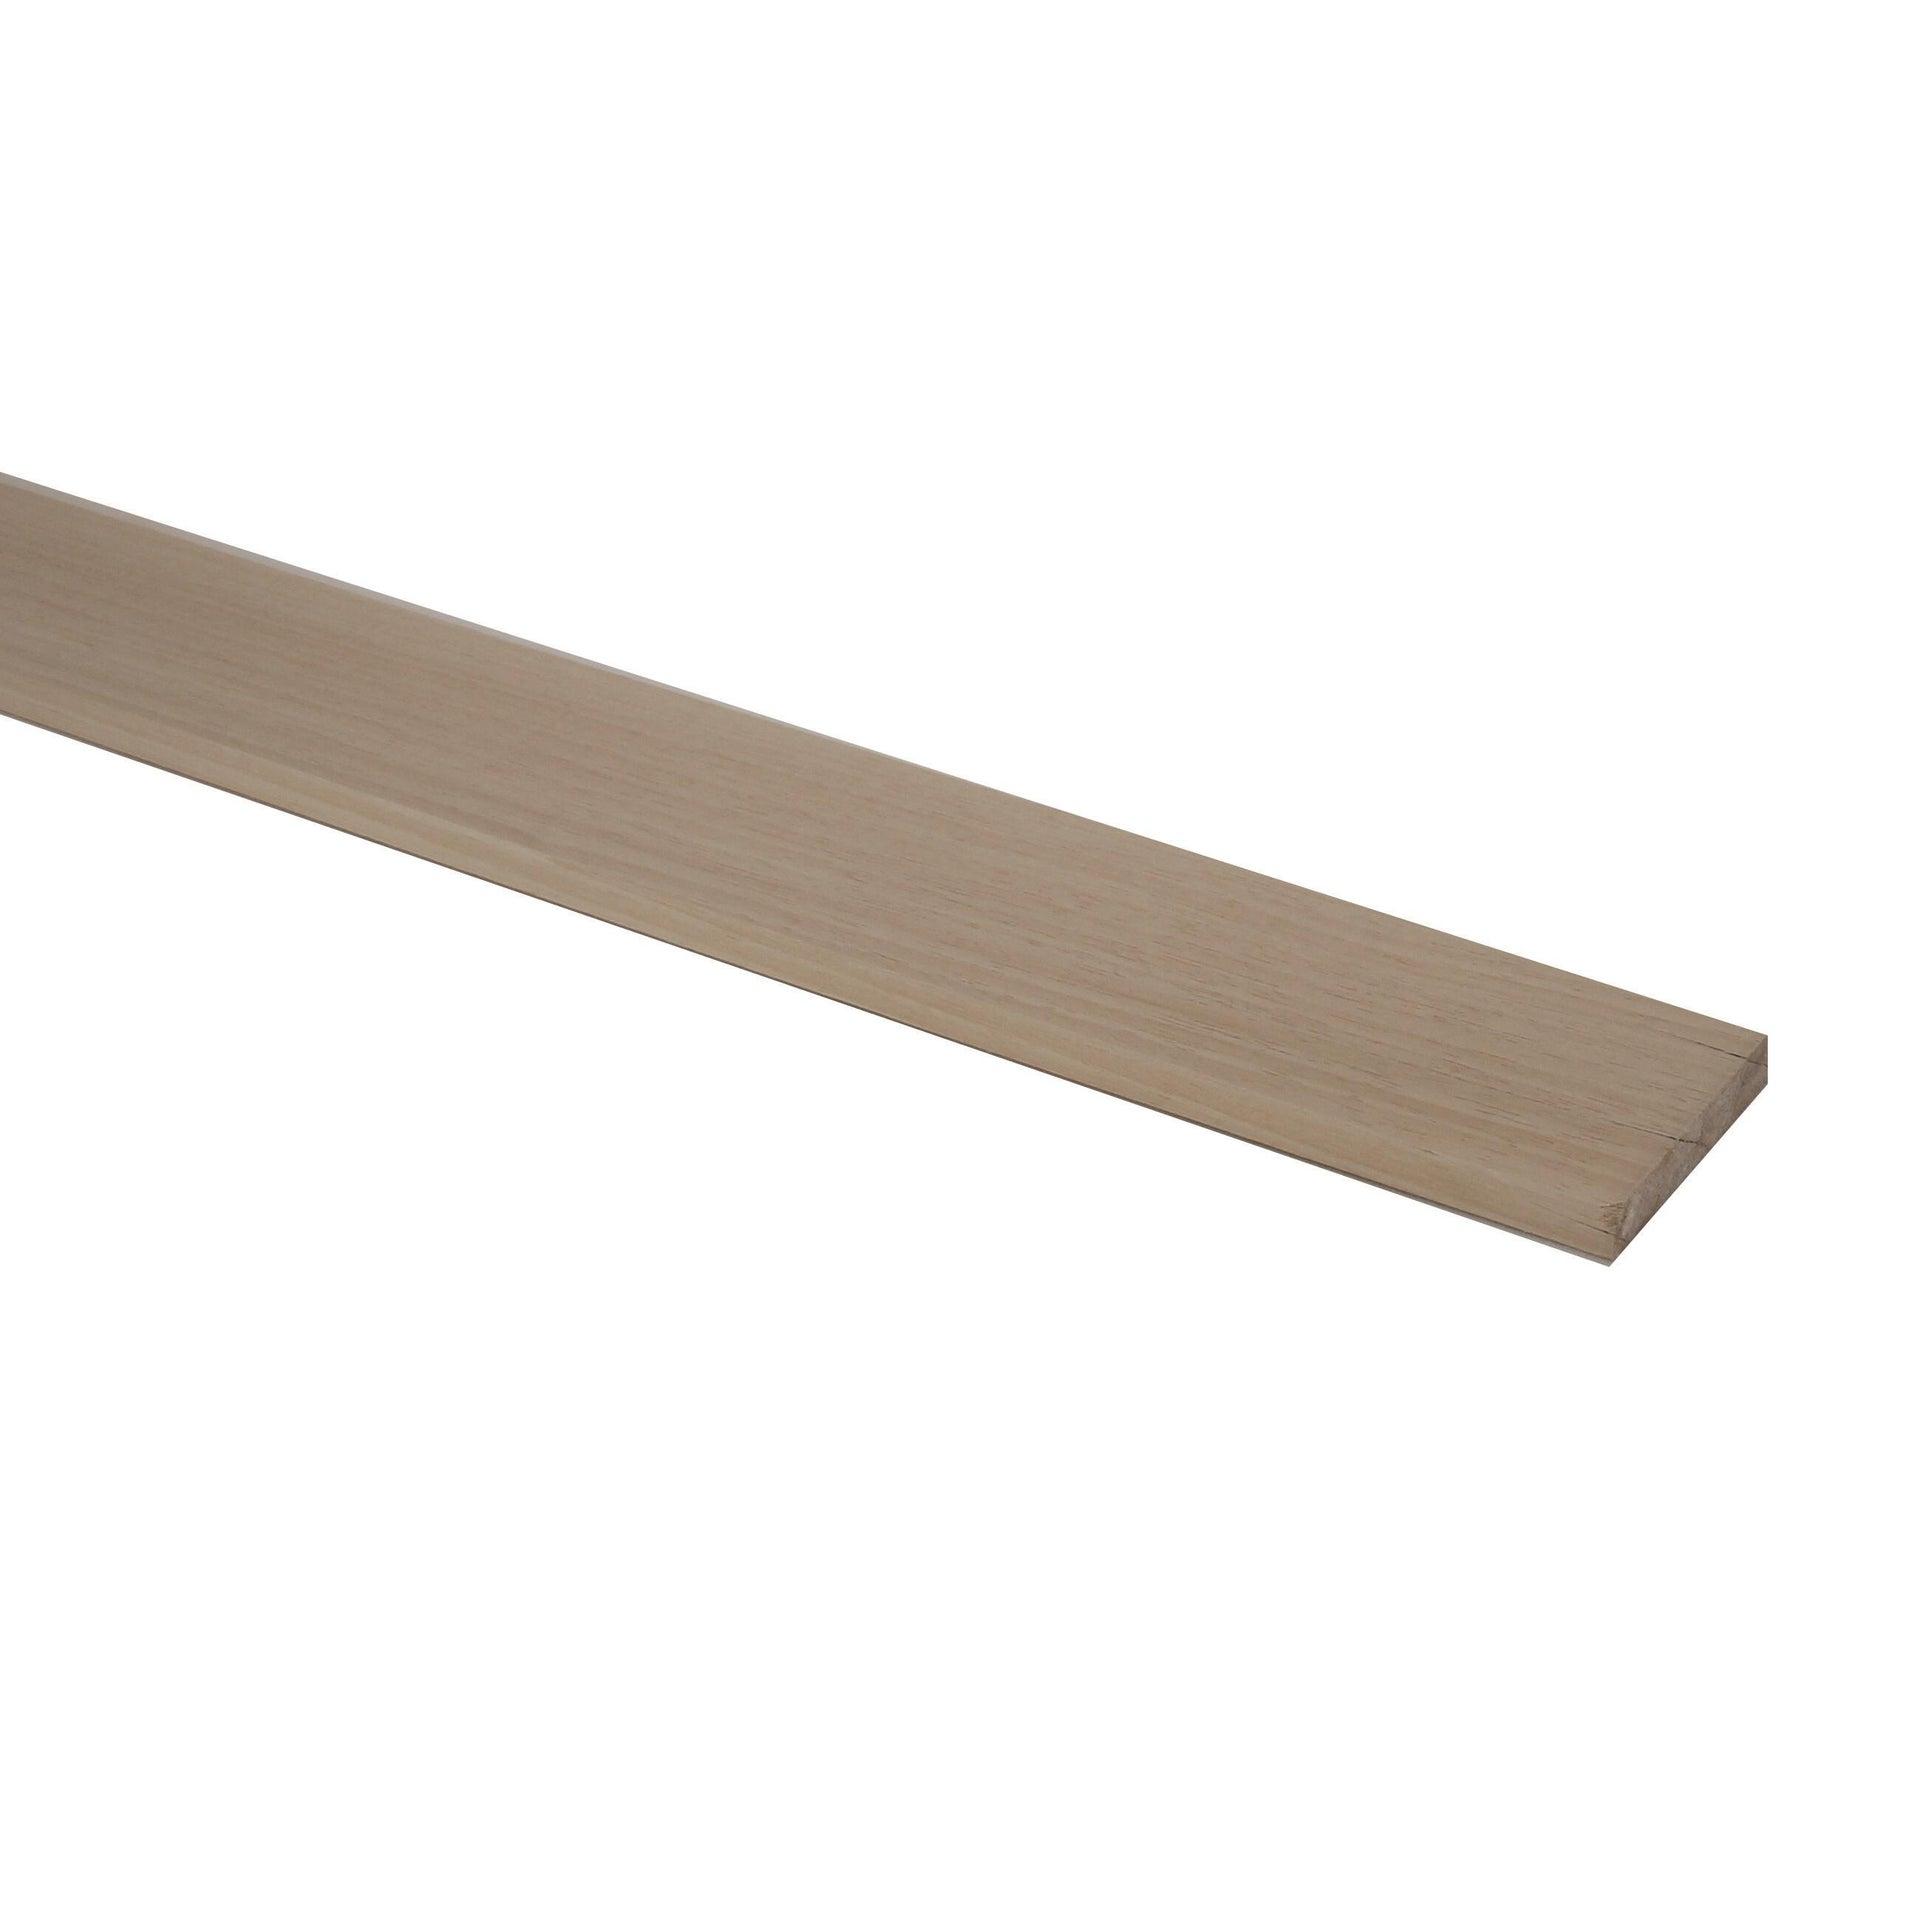 Listello piallato ayous 1 m x 50 mm, Sp 10 mm